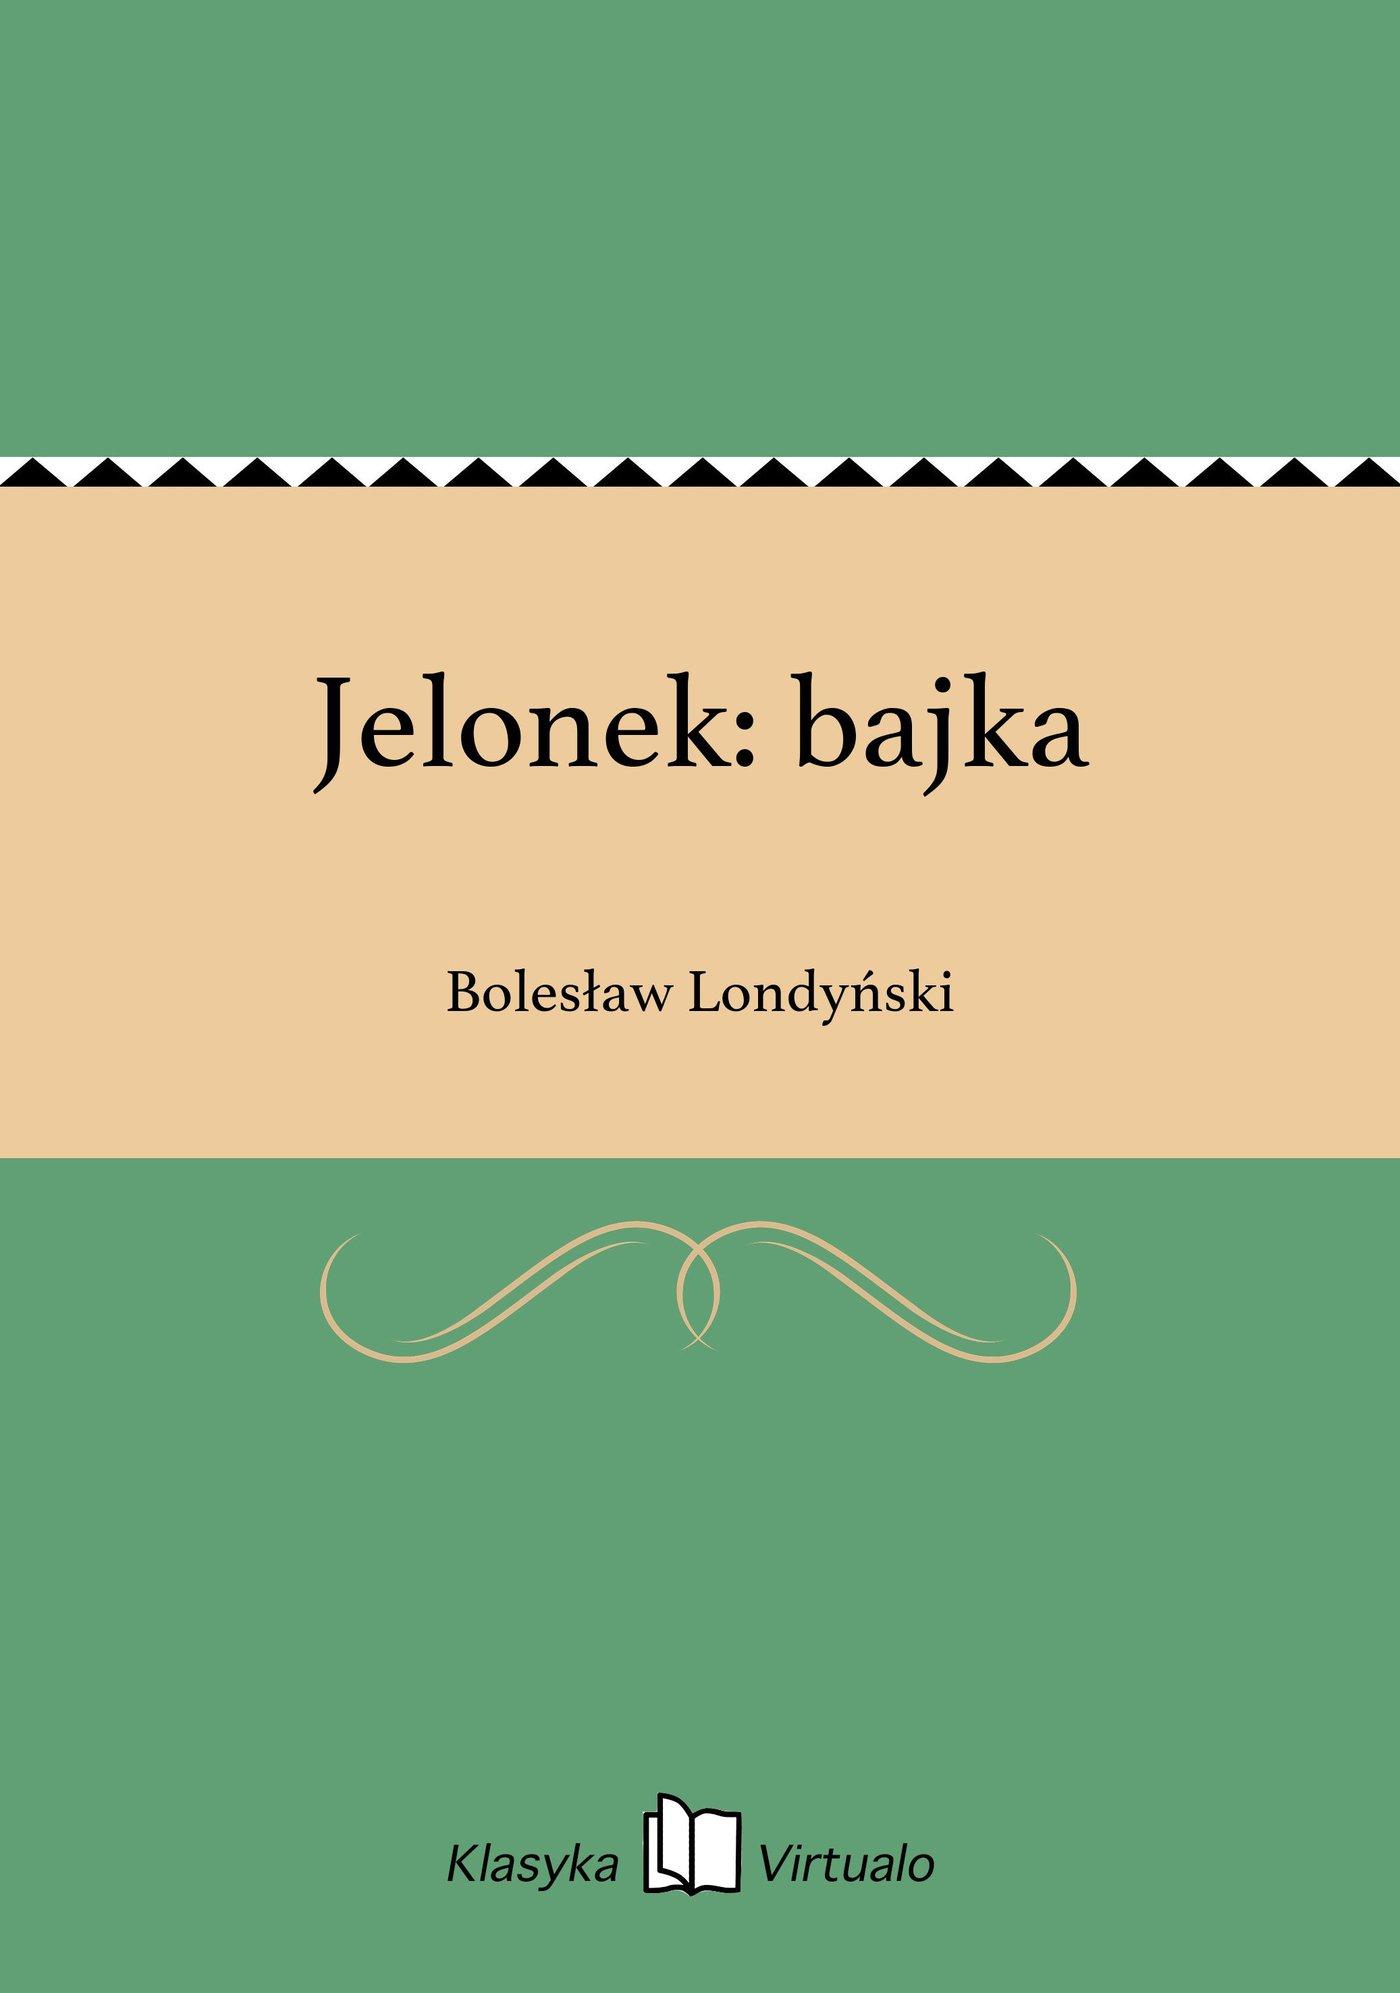 Jelonek: bajka - Ebook (Książka na Kindle) do pobrania w formacie MOBI